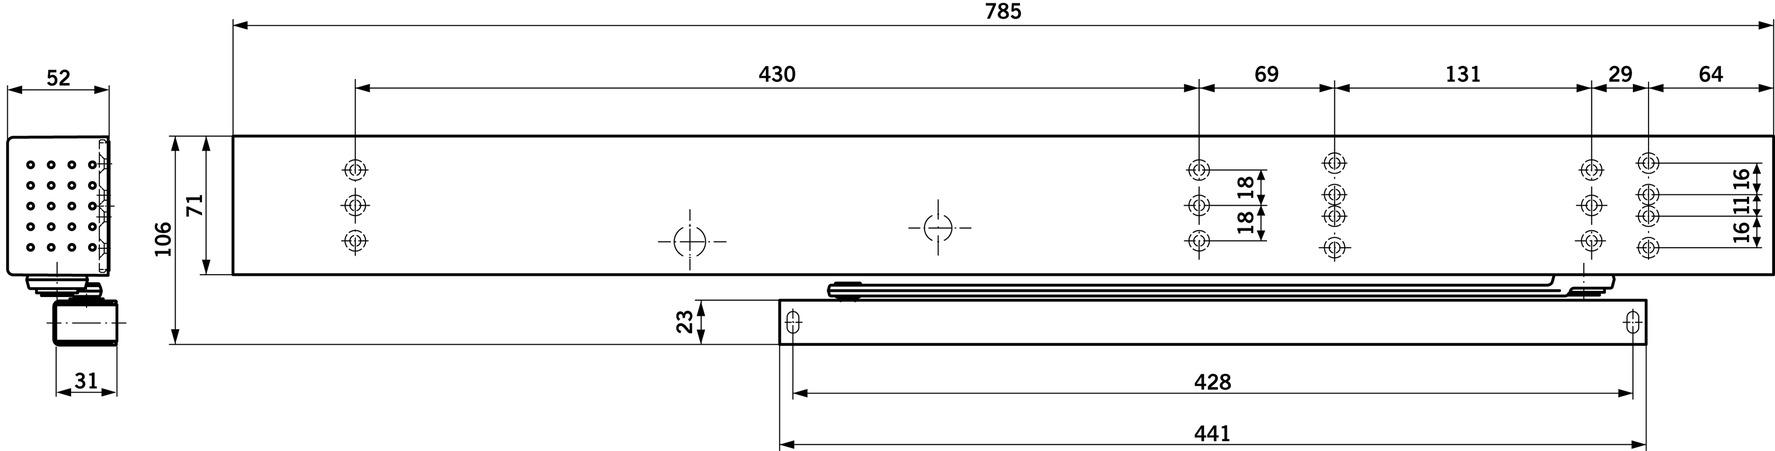 Ferme-porte débrayable DORMA TS 99 FLR / FLR-K design Contur